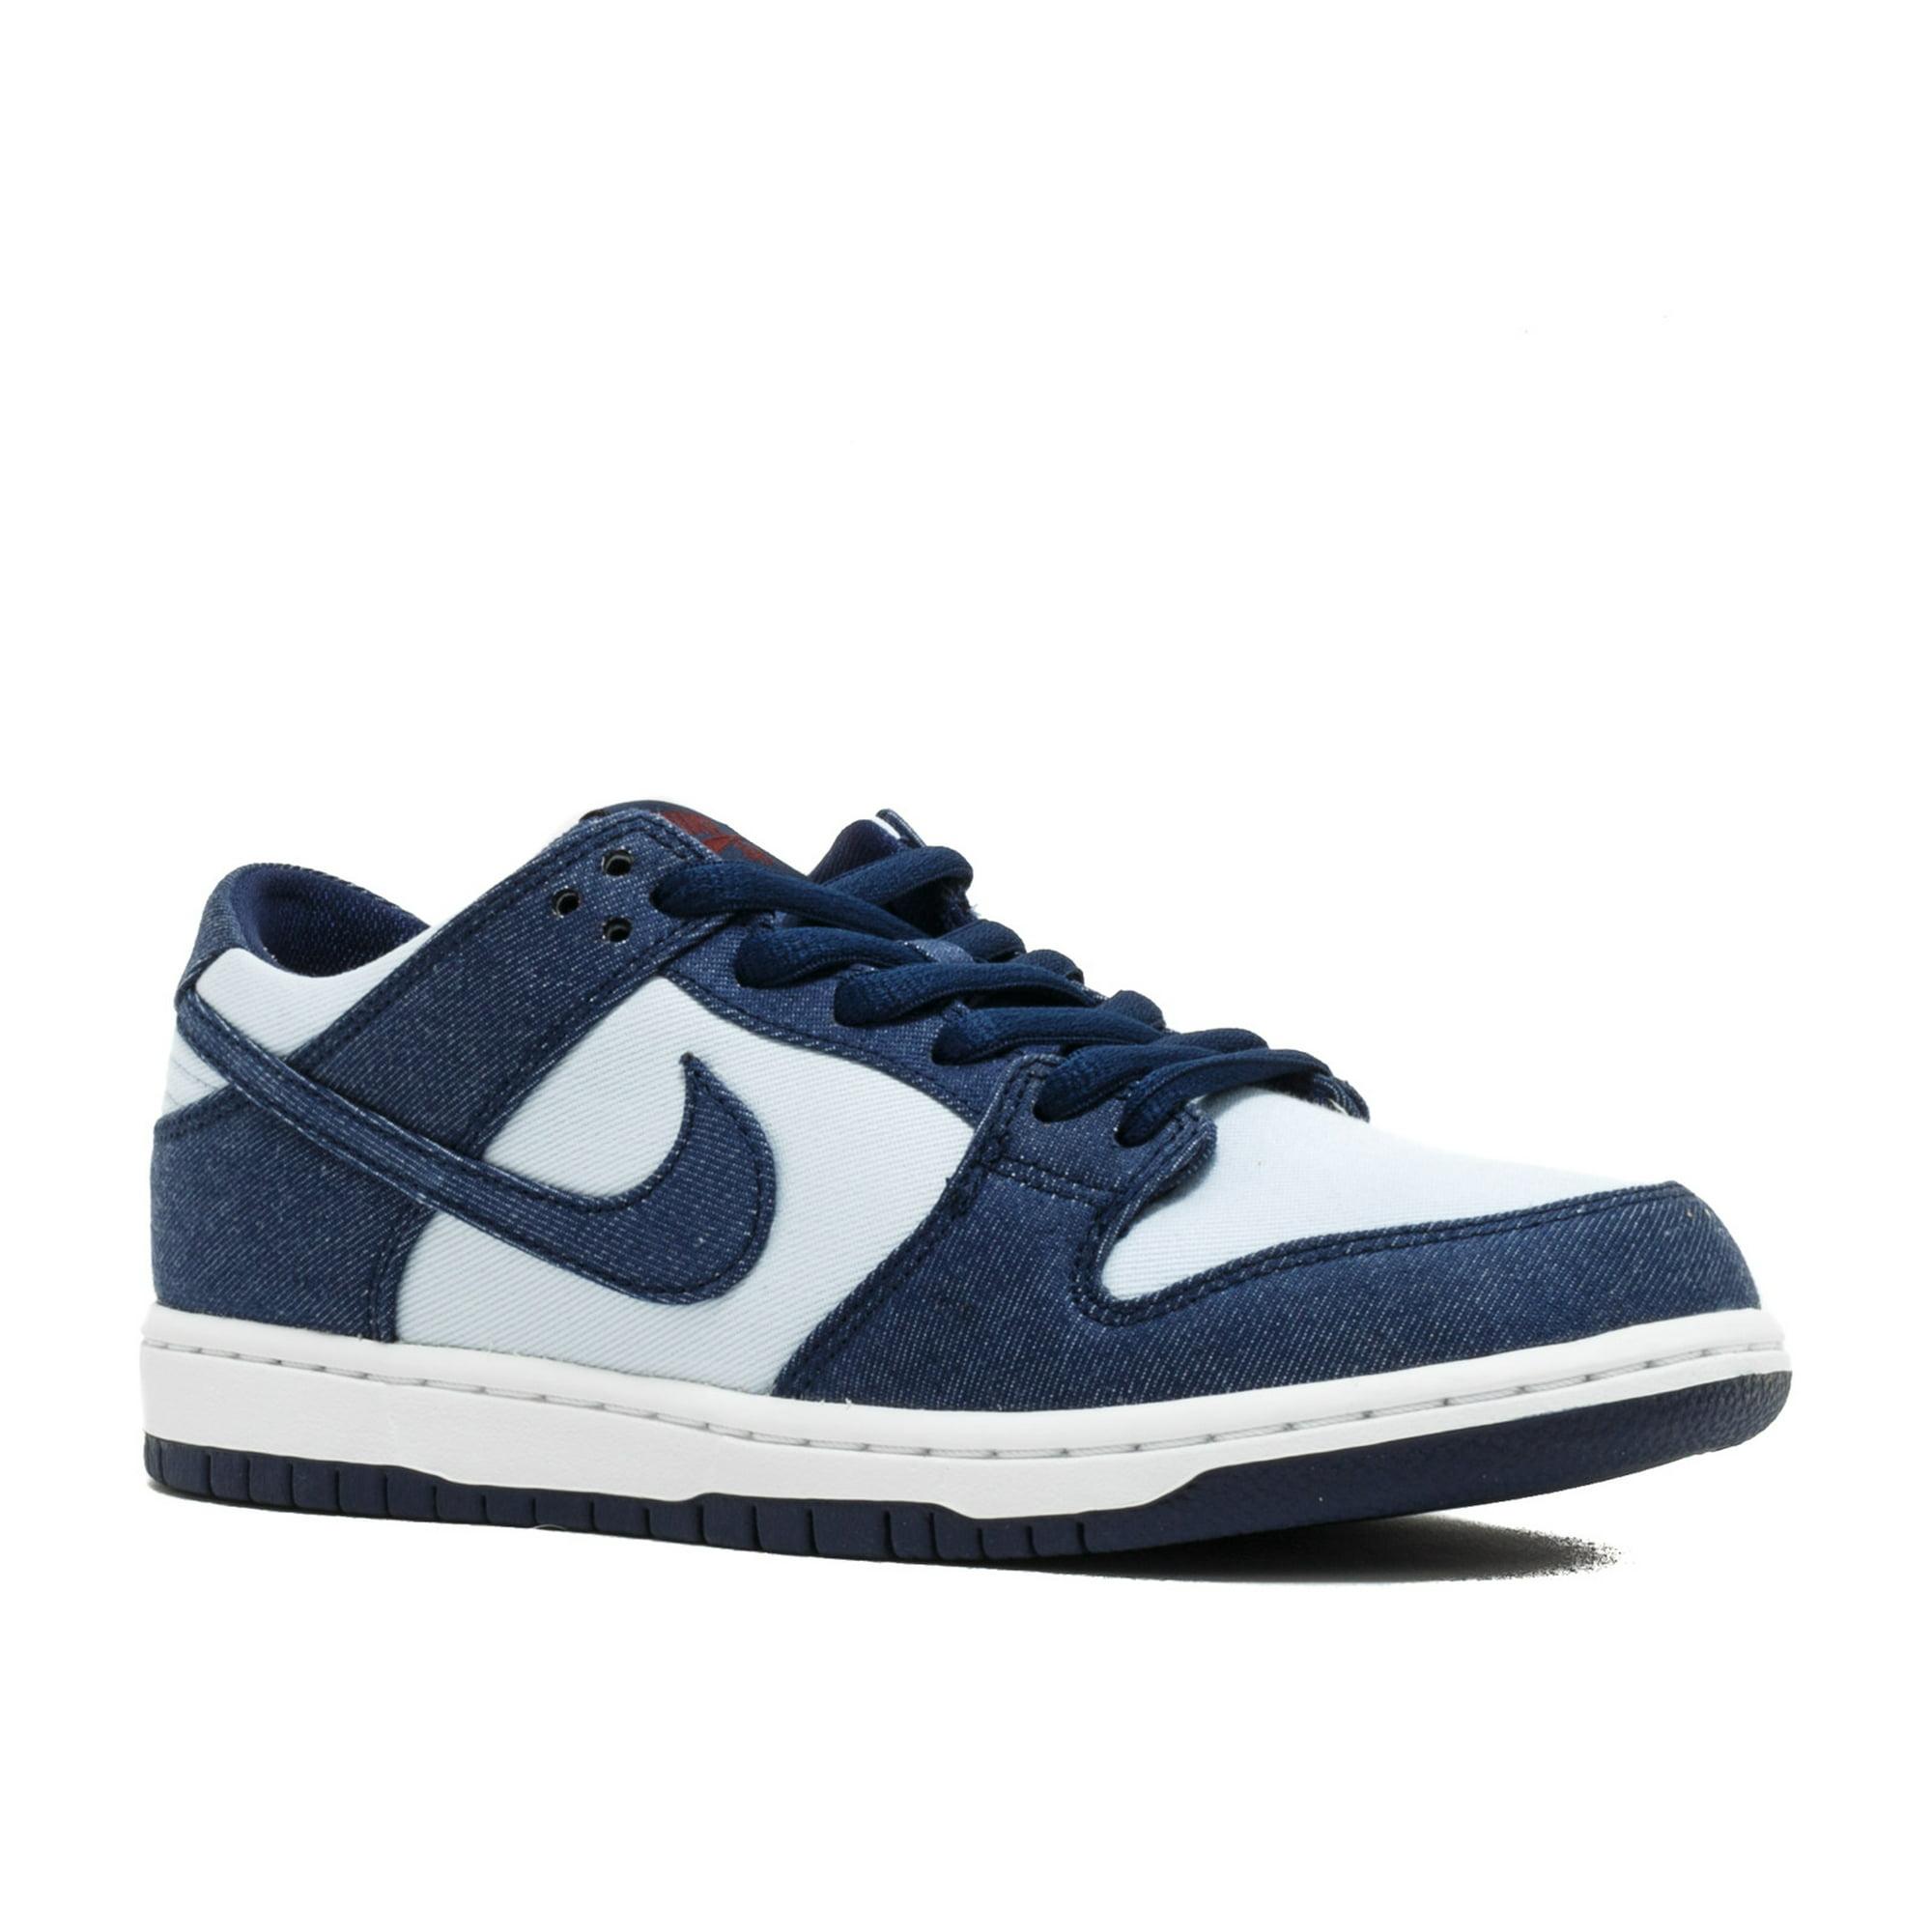 brand new 6d8ee d4f69 Nike - Men - Nike Sb Zoom Dunk Low Pro 'Binary Blue' - 854866-444 - Size  11.5